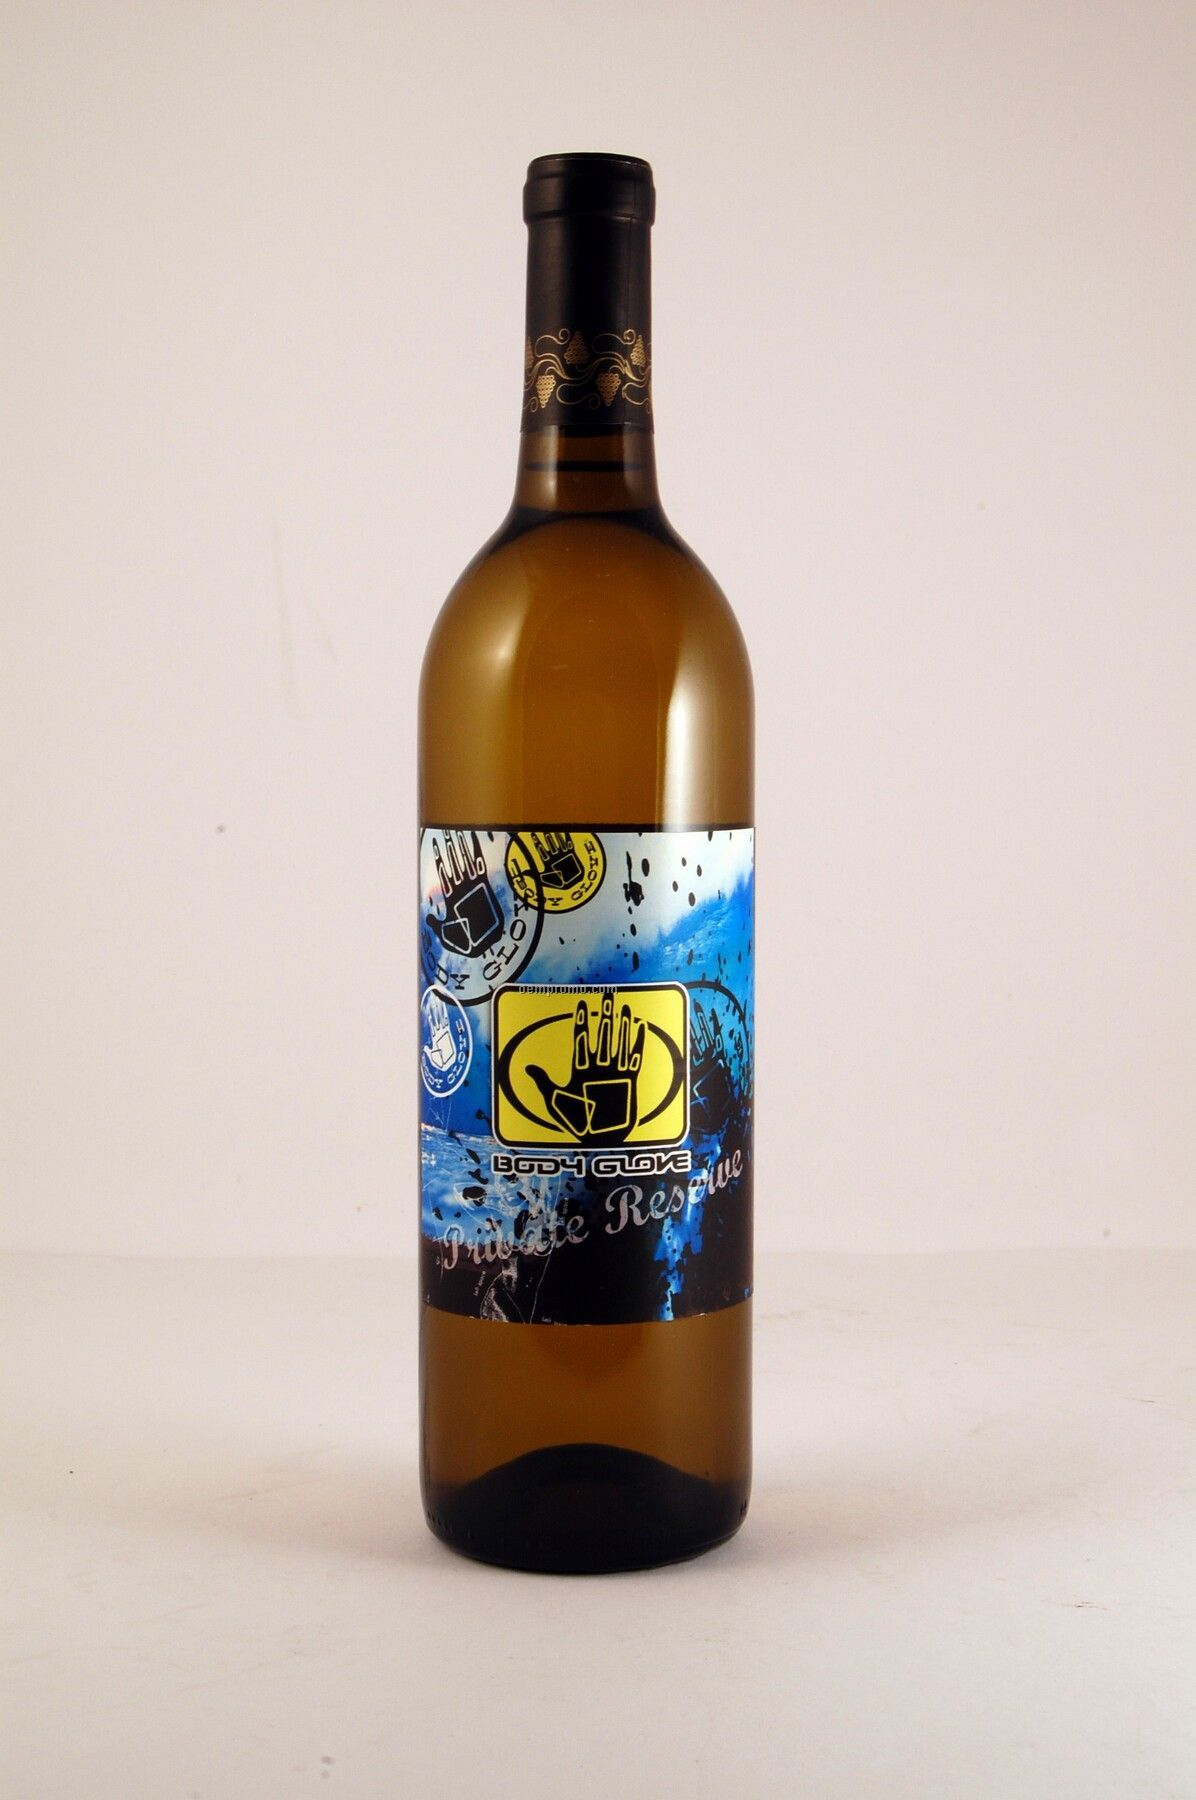 2009 Wv Chardonnay, Sonoma County, Barrel Fermented (Custom Labeled Wine)